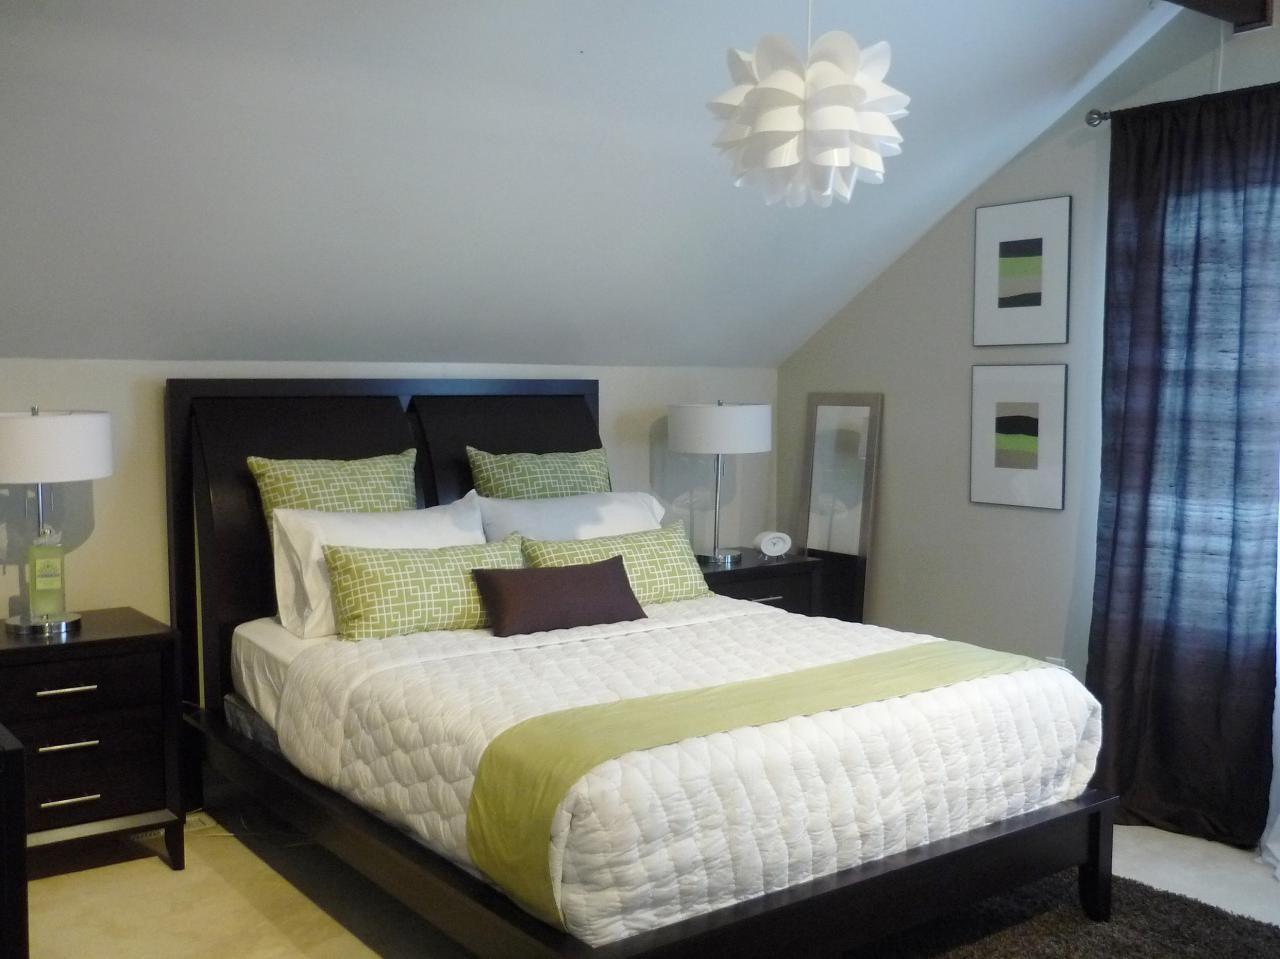 Bedroom Designs On A Budget Budget Bedroom Designs  Budget Bedroom Design Bedroom And Hgtv